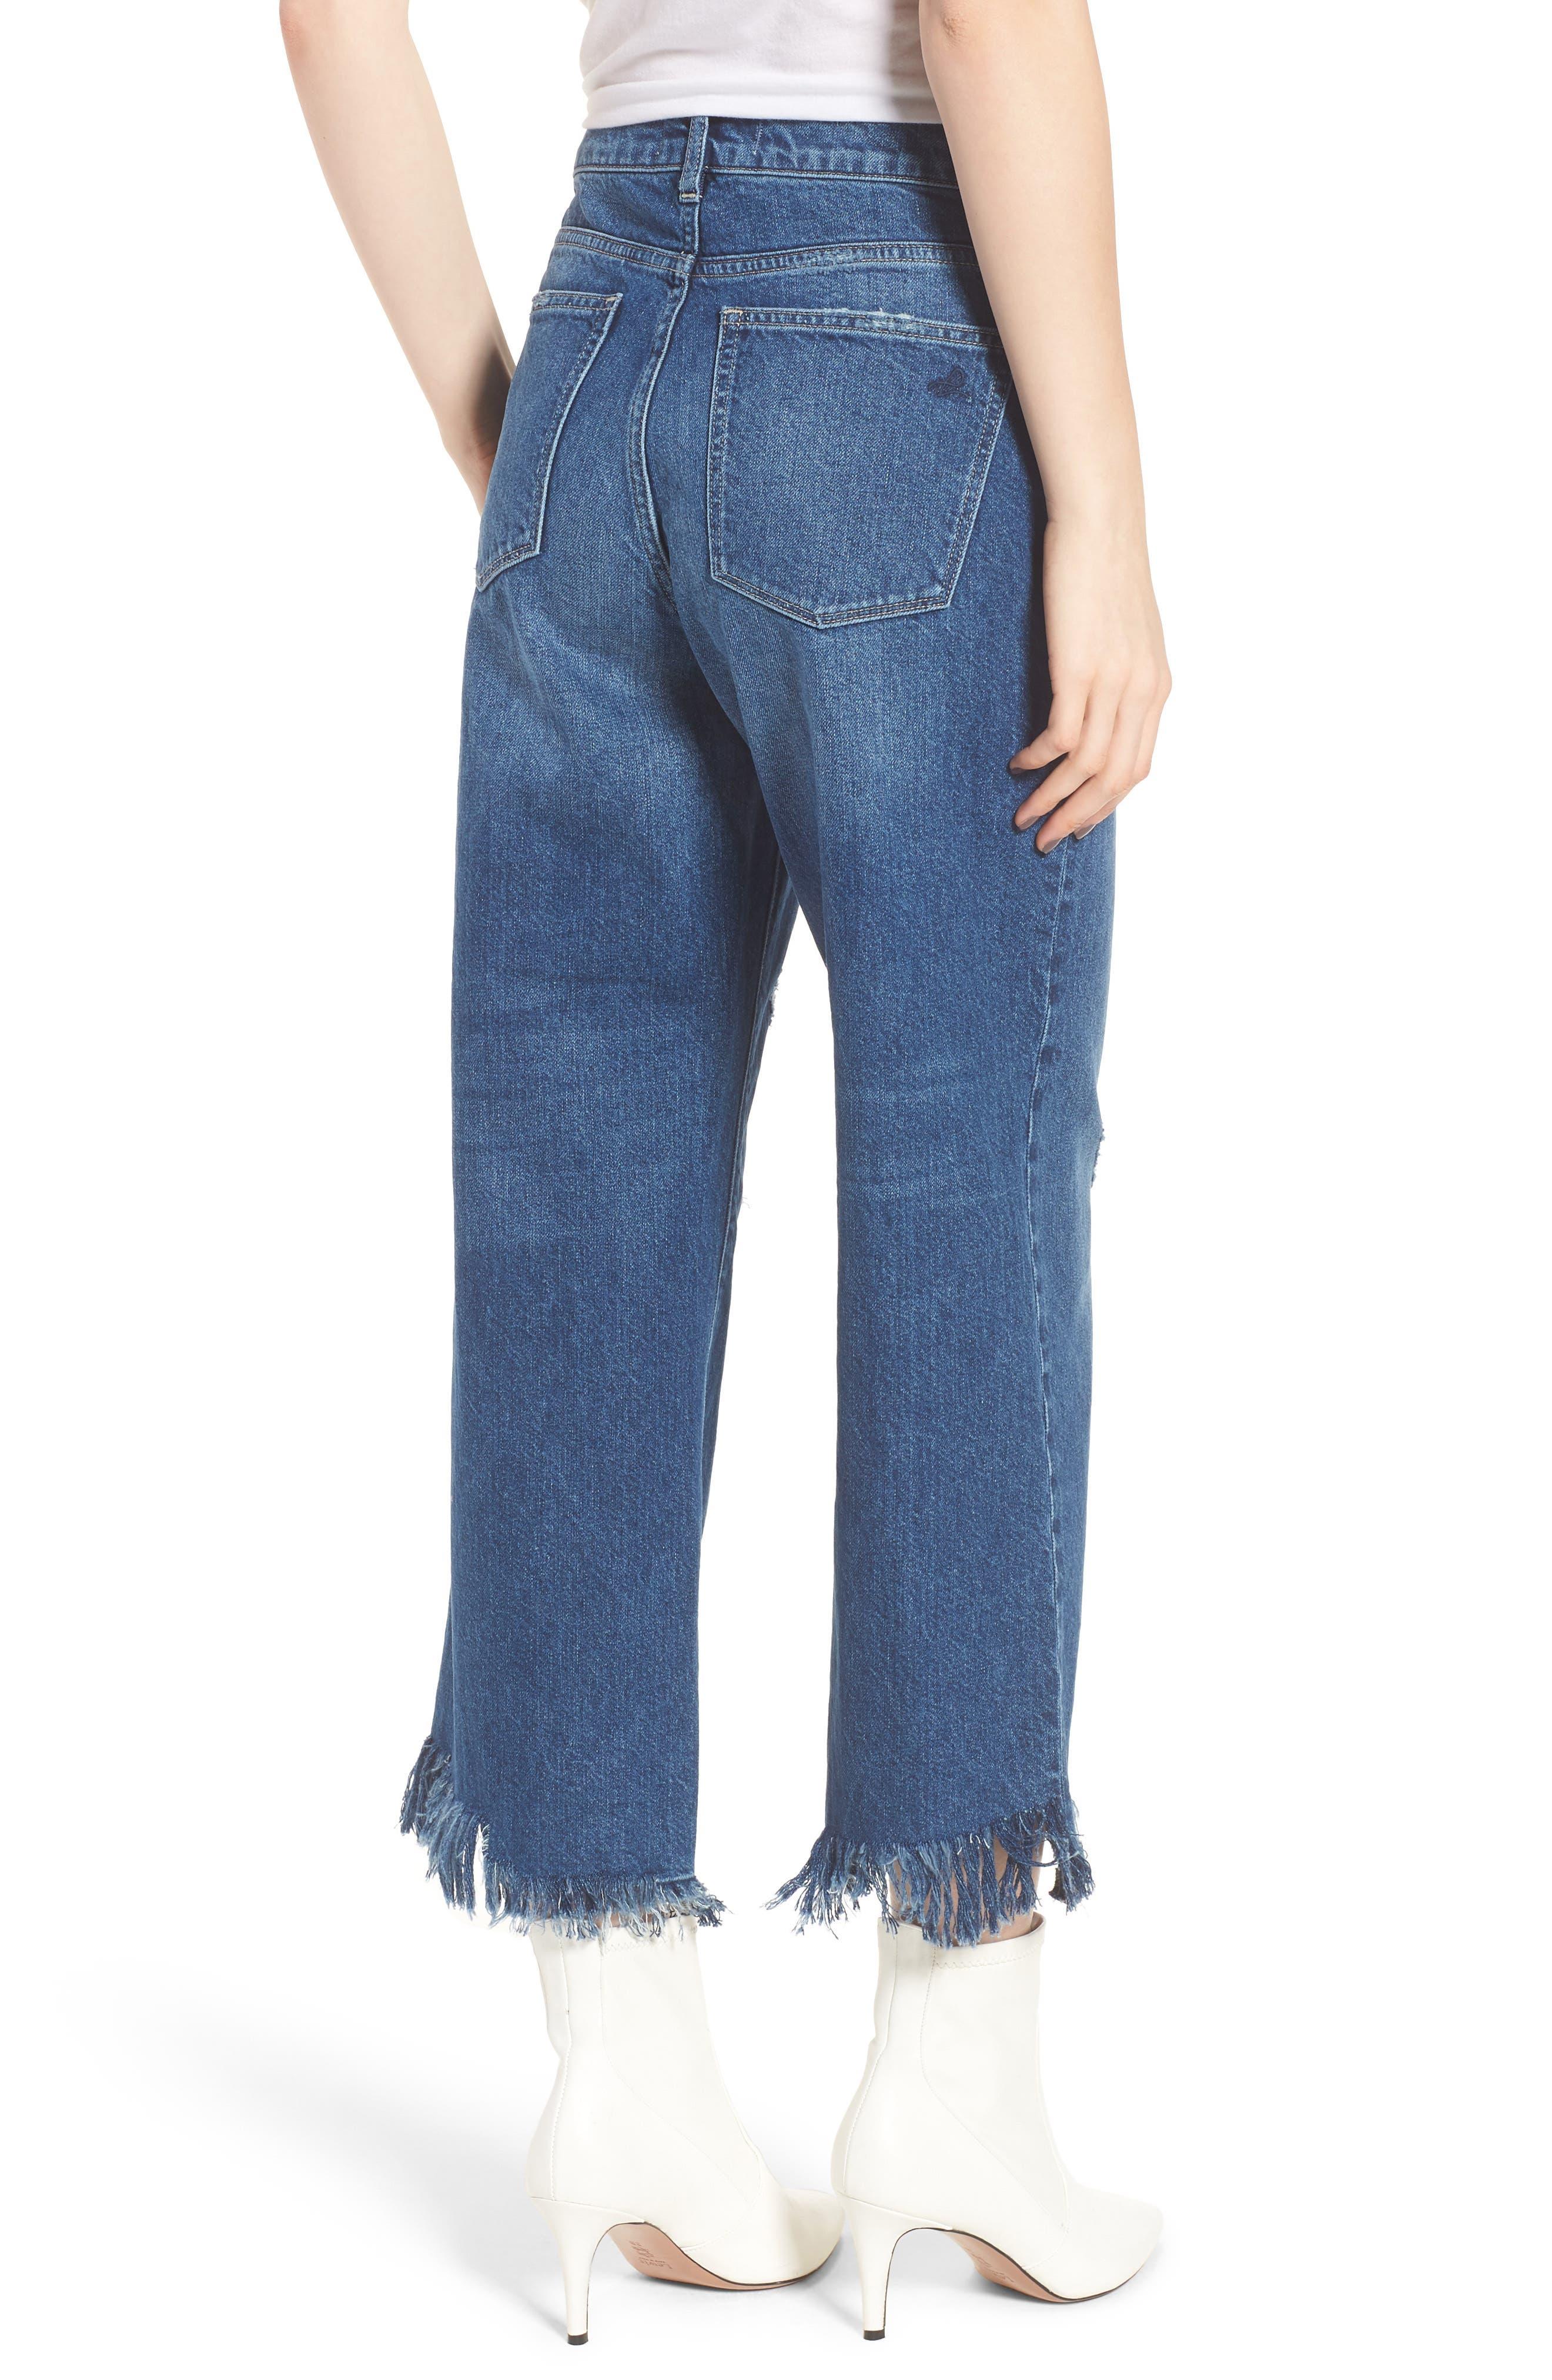 Hepburn High Waist Wide Leg Jeans,                             Alternate thumbnail 2, color,